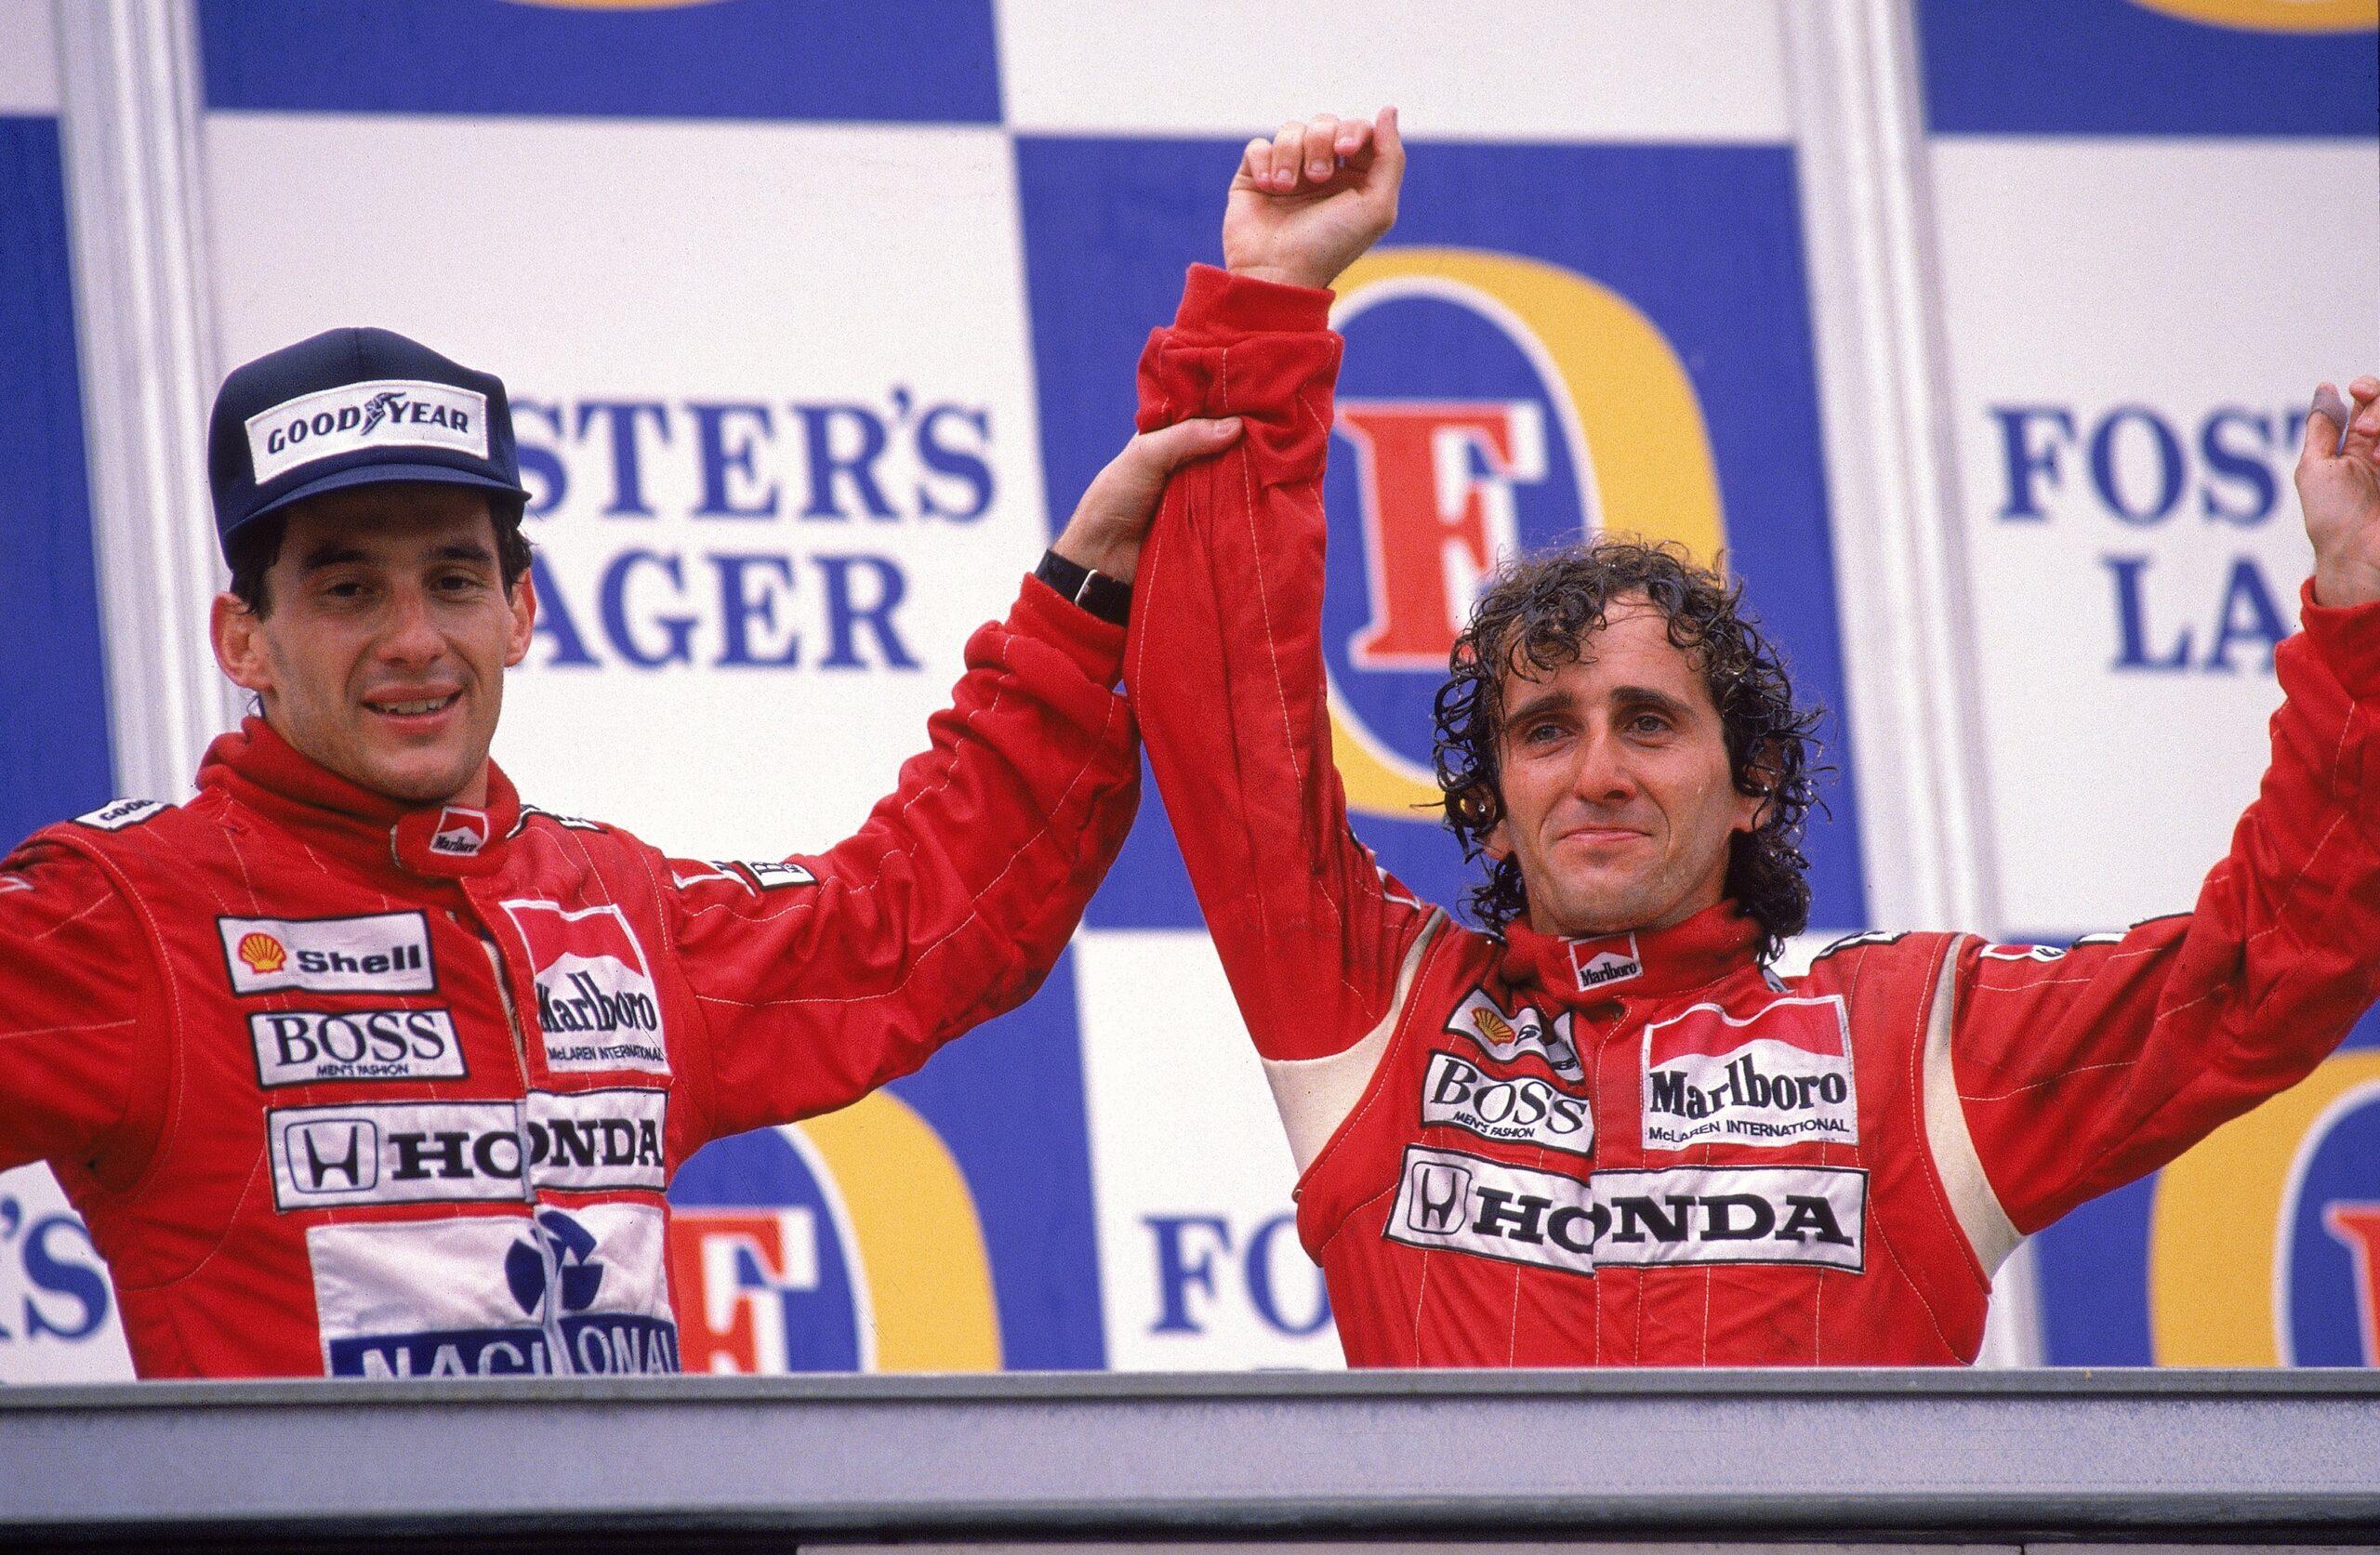 Ayrton Senna Alain Prost Formuła 1